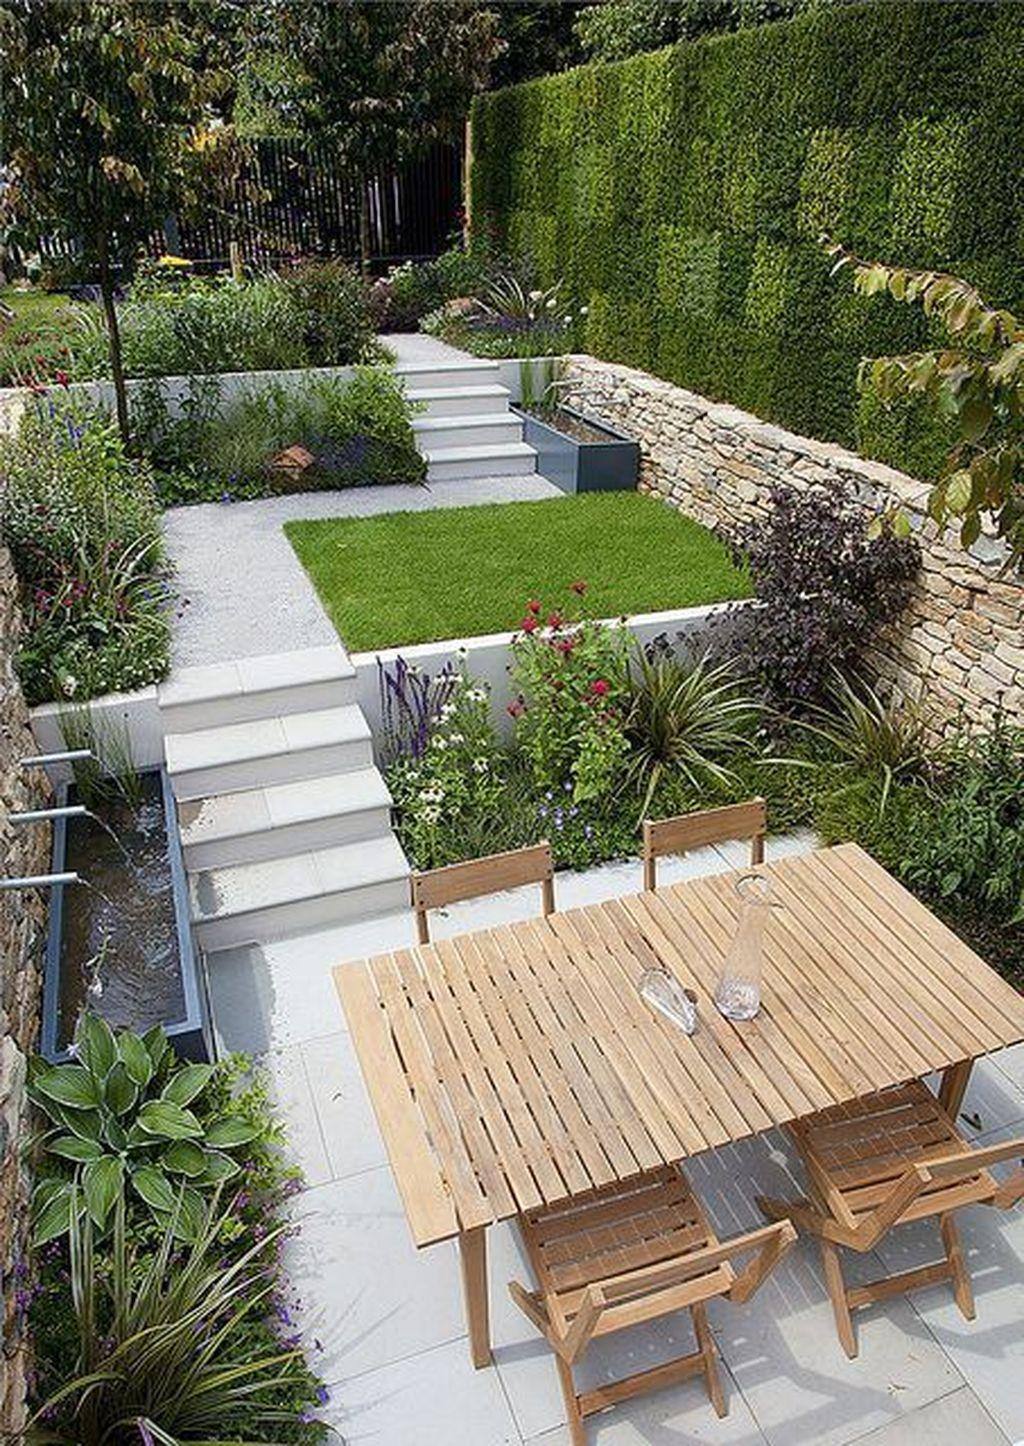 Inspiring Minimalist Garden Landscape Ideas That You Will Like 16